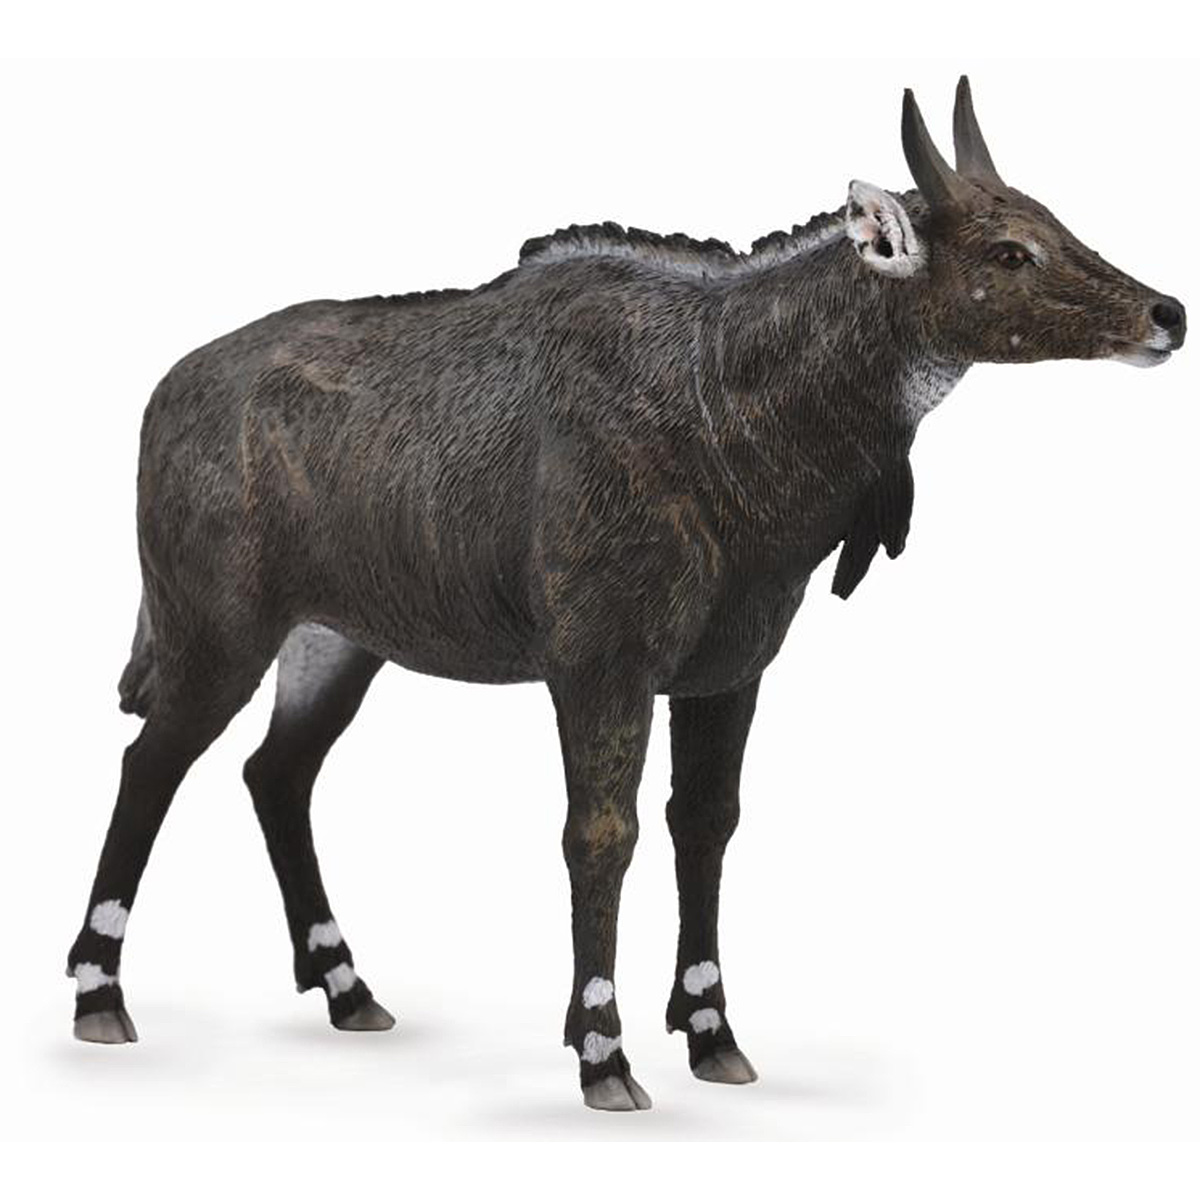 Фигурка животного  Антилопа нильгау, размер M - Фигурки животных, артикул: 152369